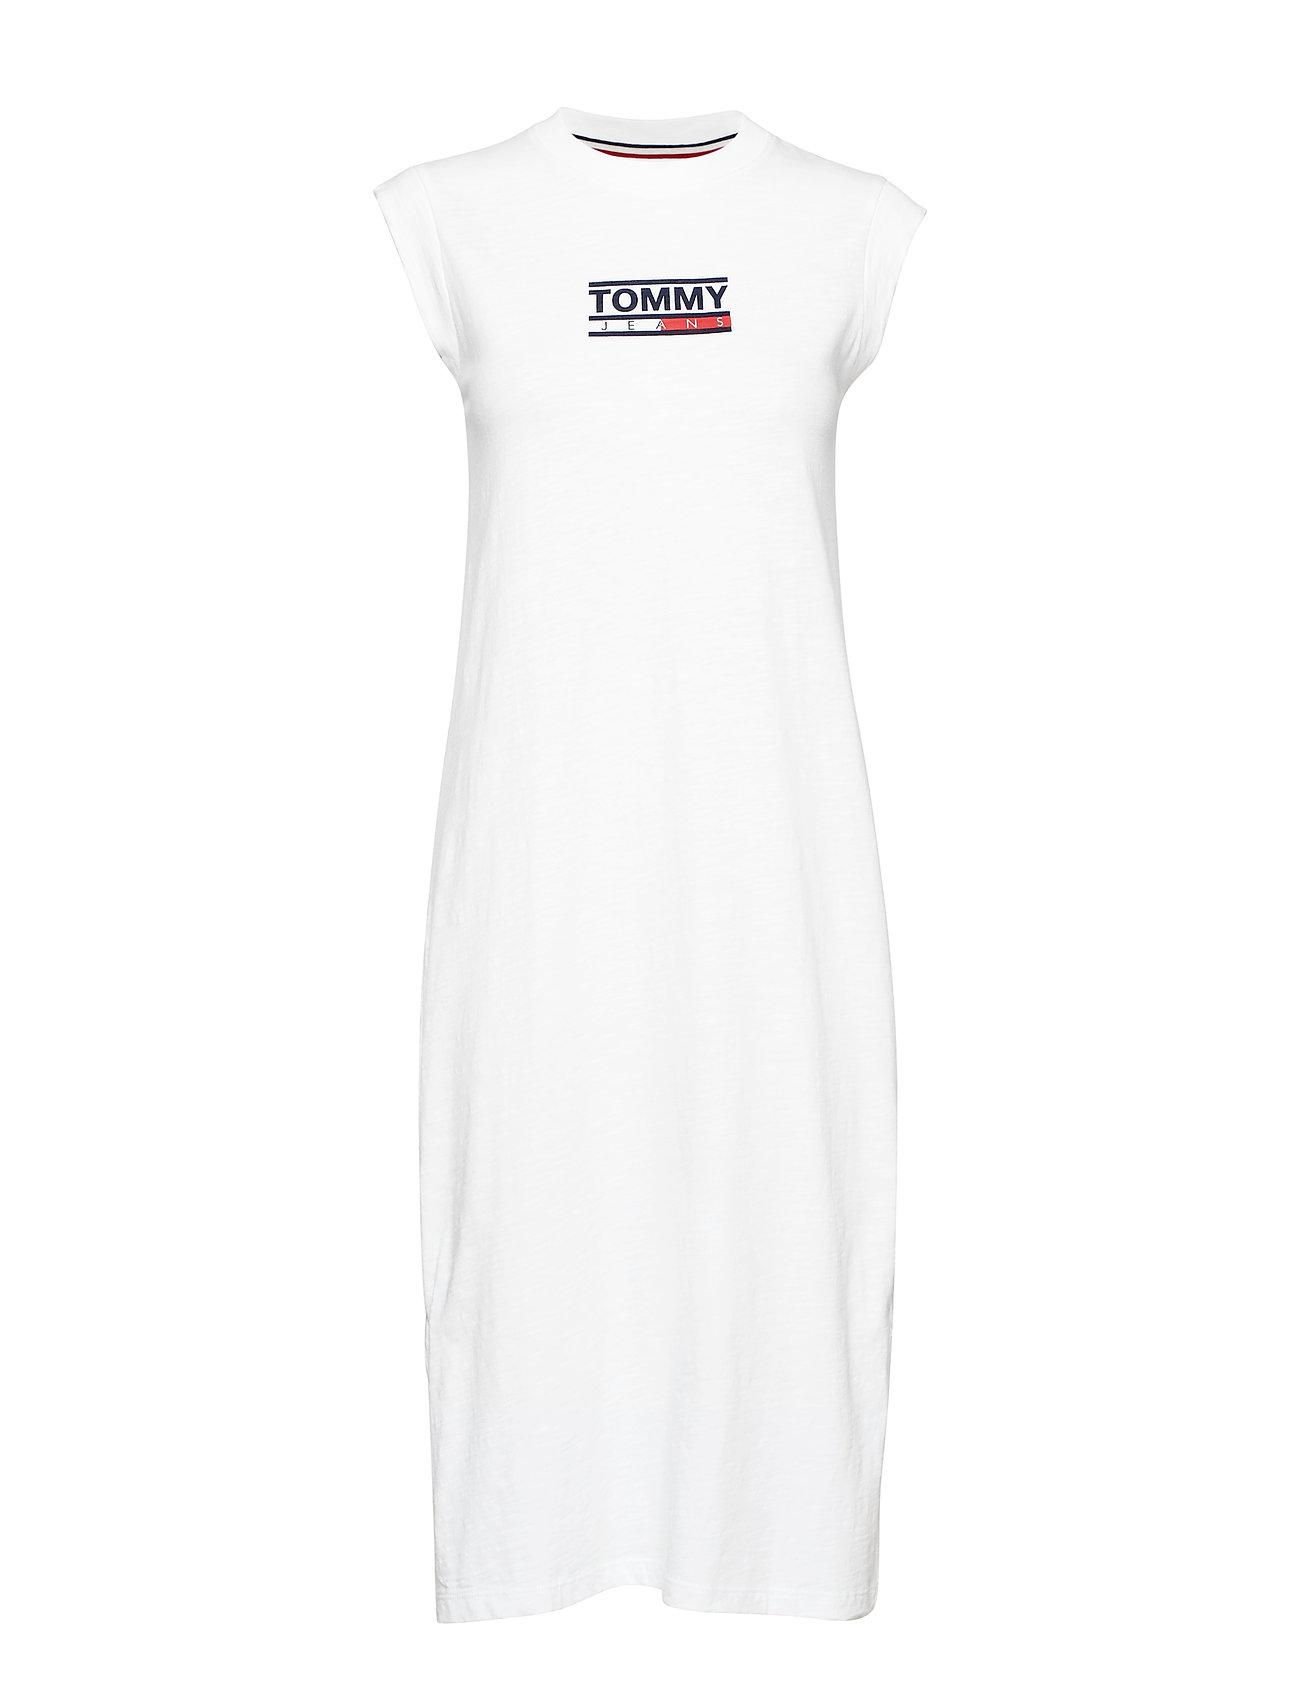 Tommy Jeans TJW LOGO TANK DRESS, - CLASSIC WHITE